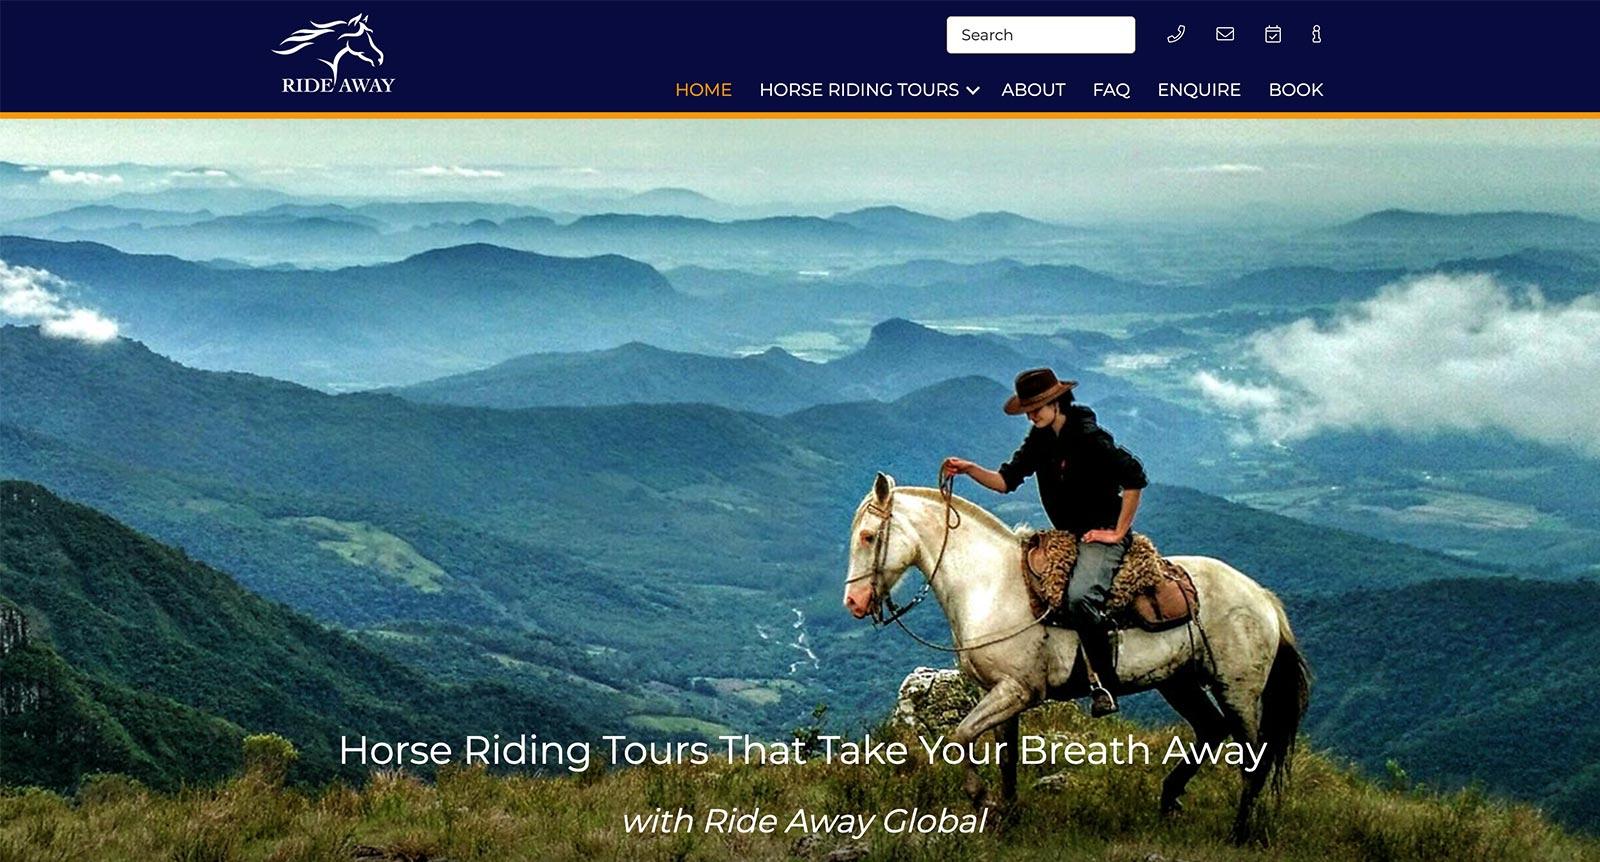 Ride Away Global Horse Riding Tours